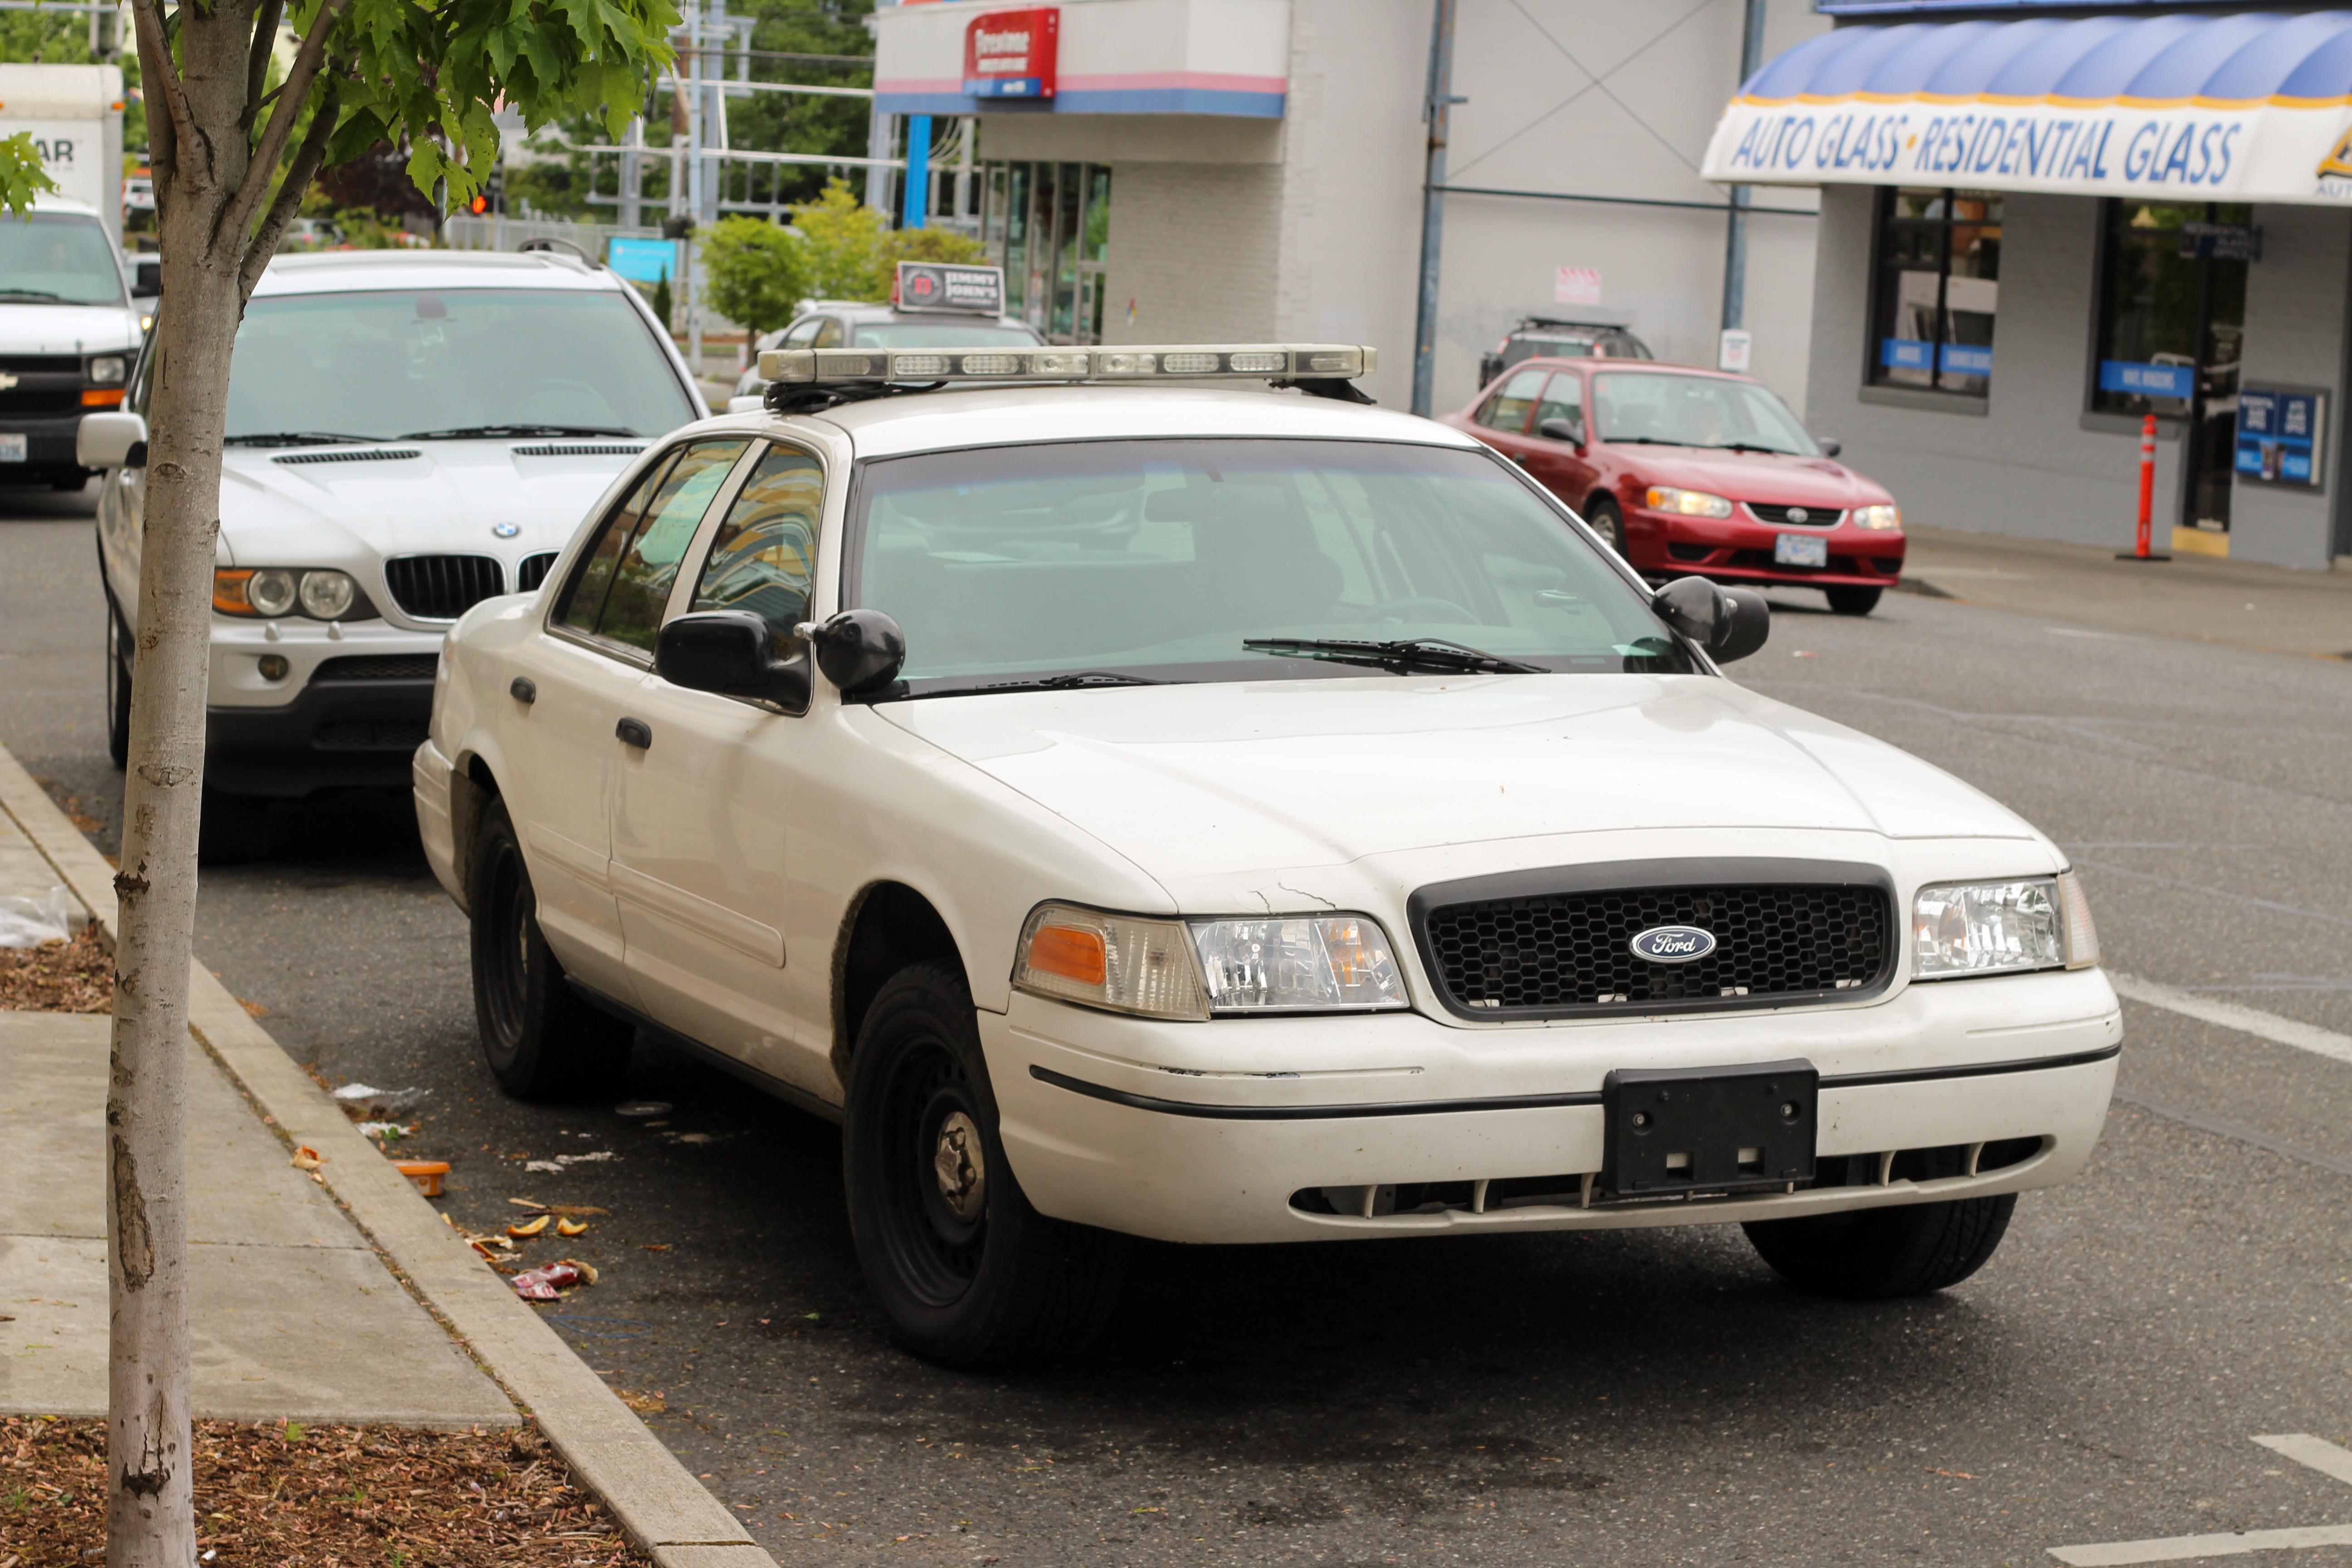 File:Fake Police Car (17060064244) jpg - Wikimedia Commons